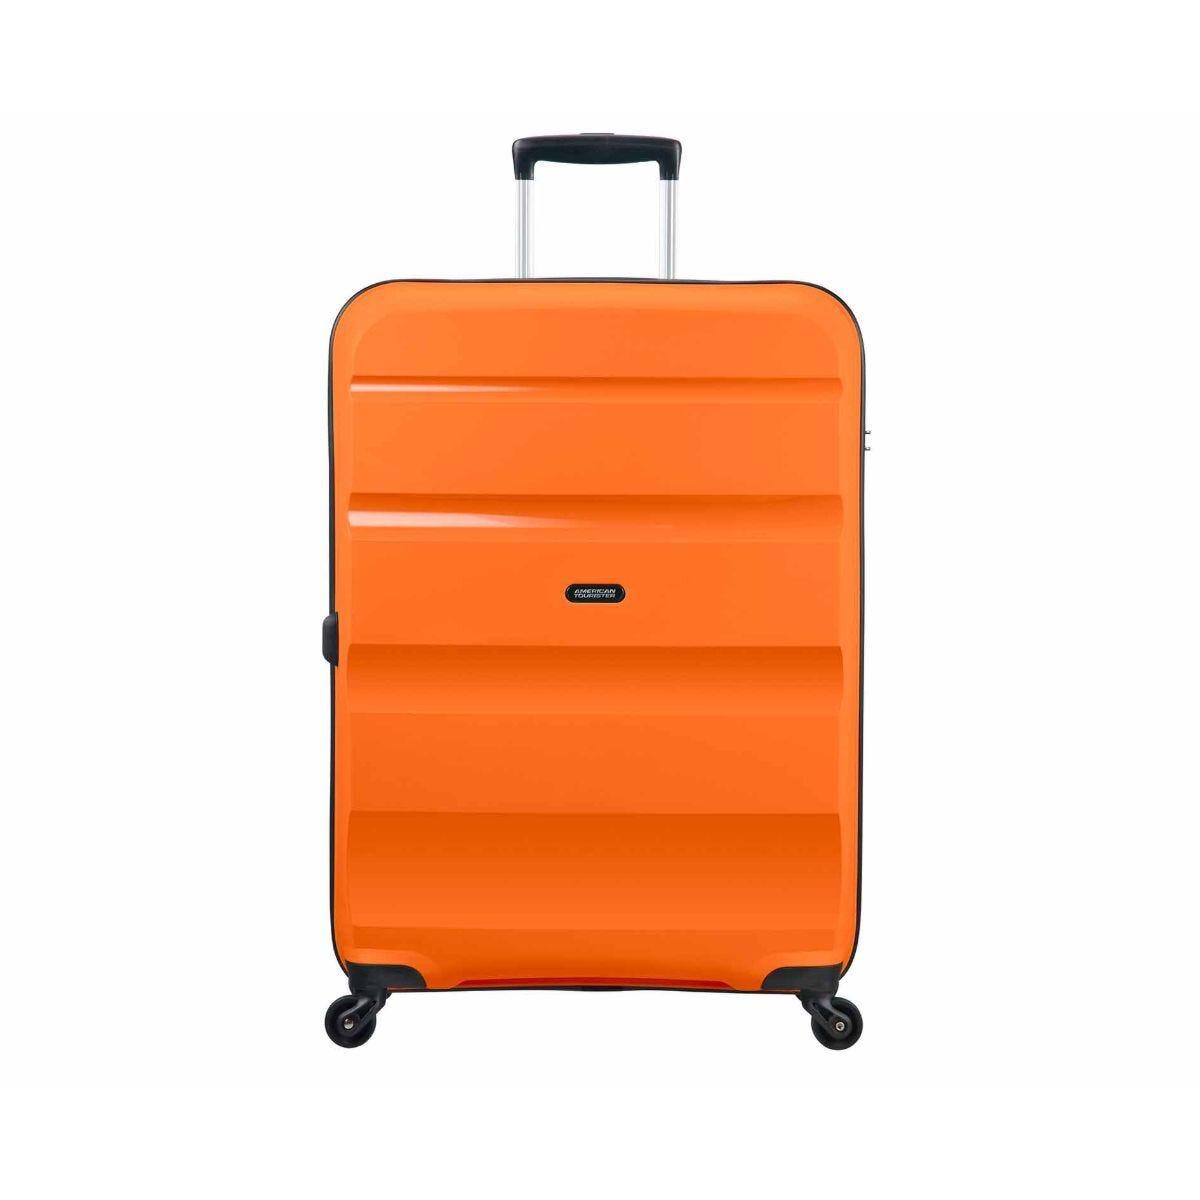 American Tourister Bon Air Cabin Suitcase Tangerine Orange